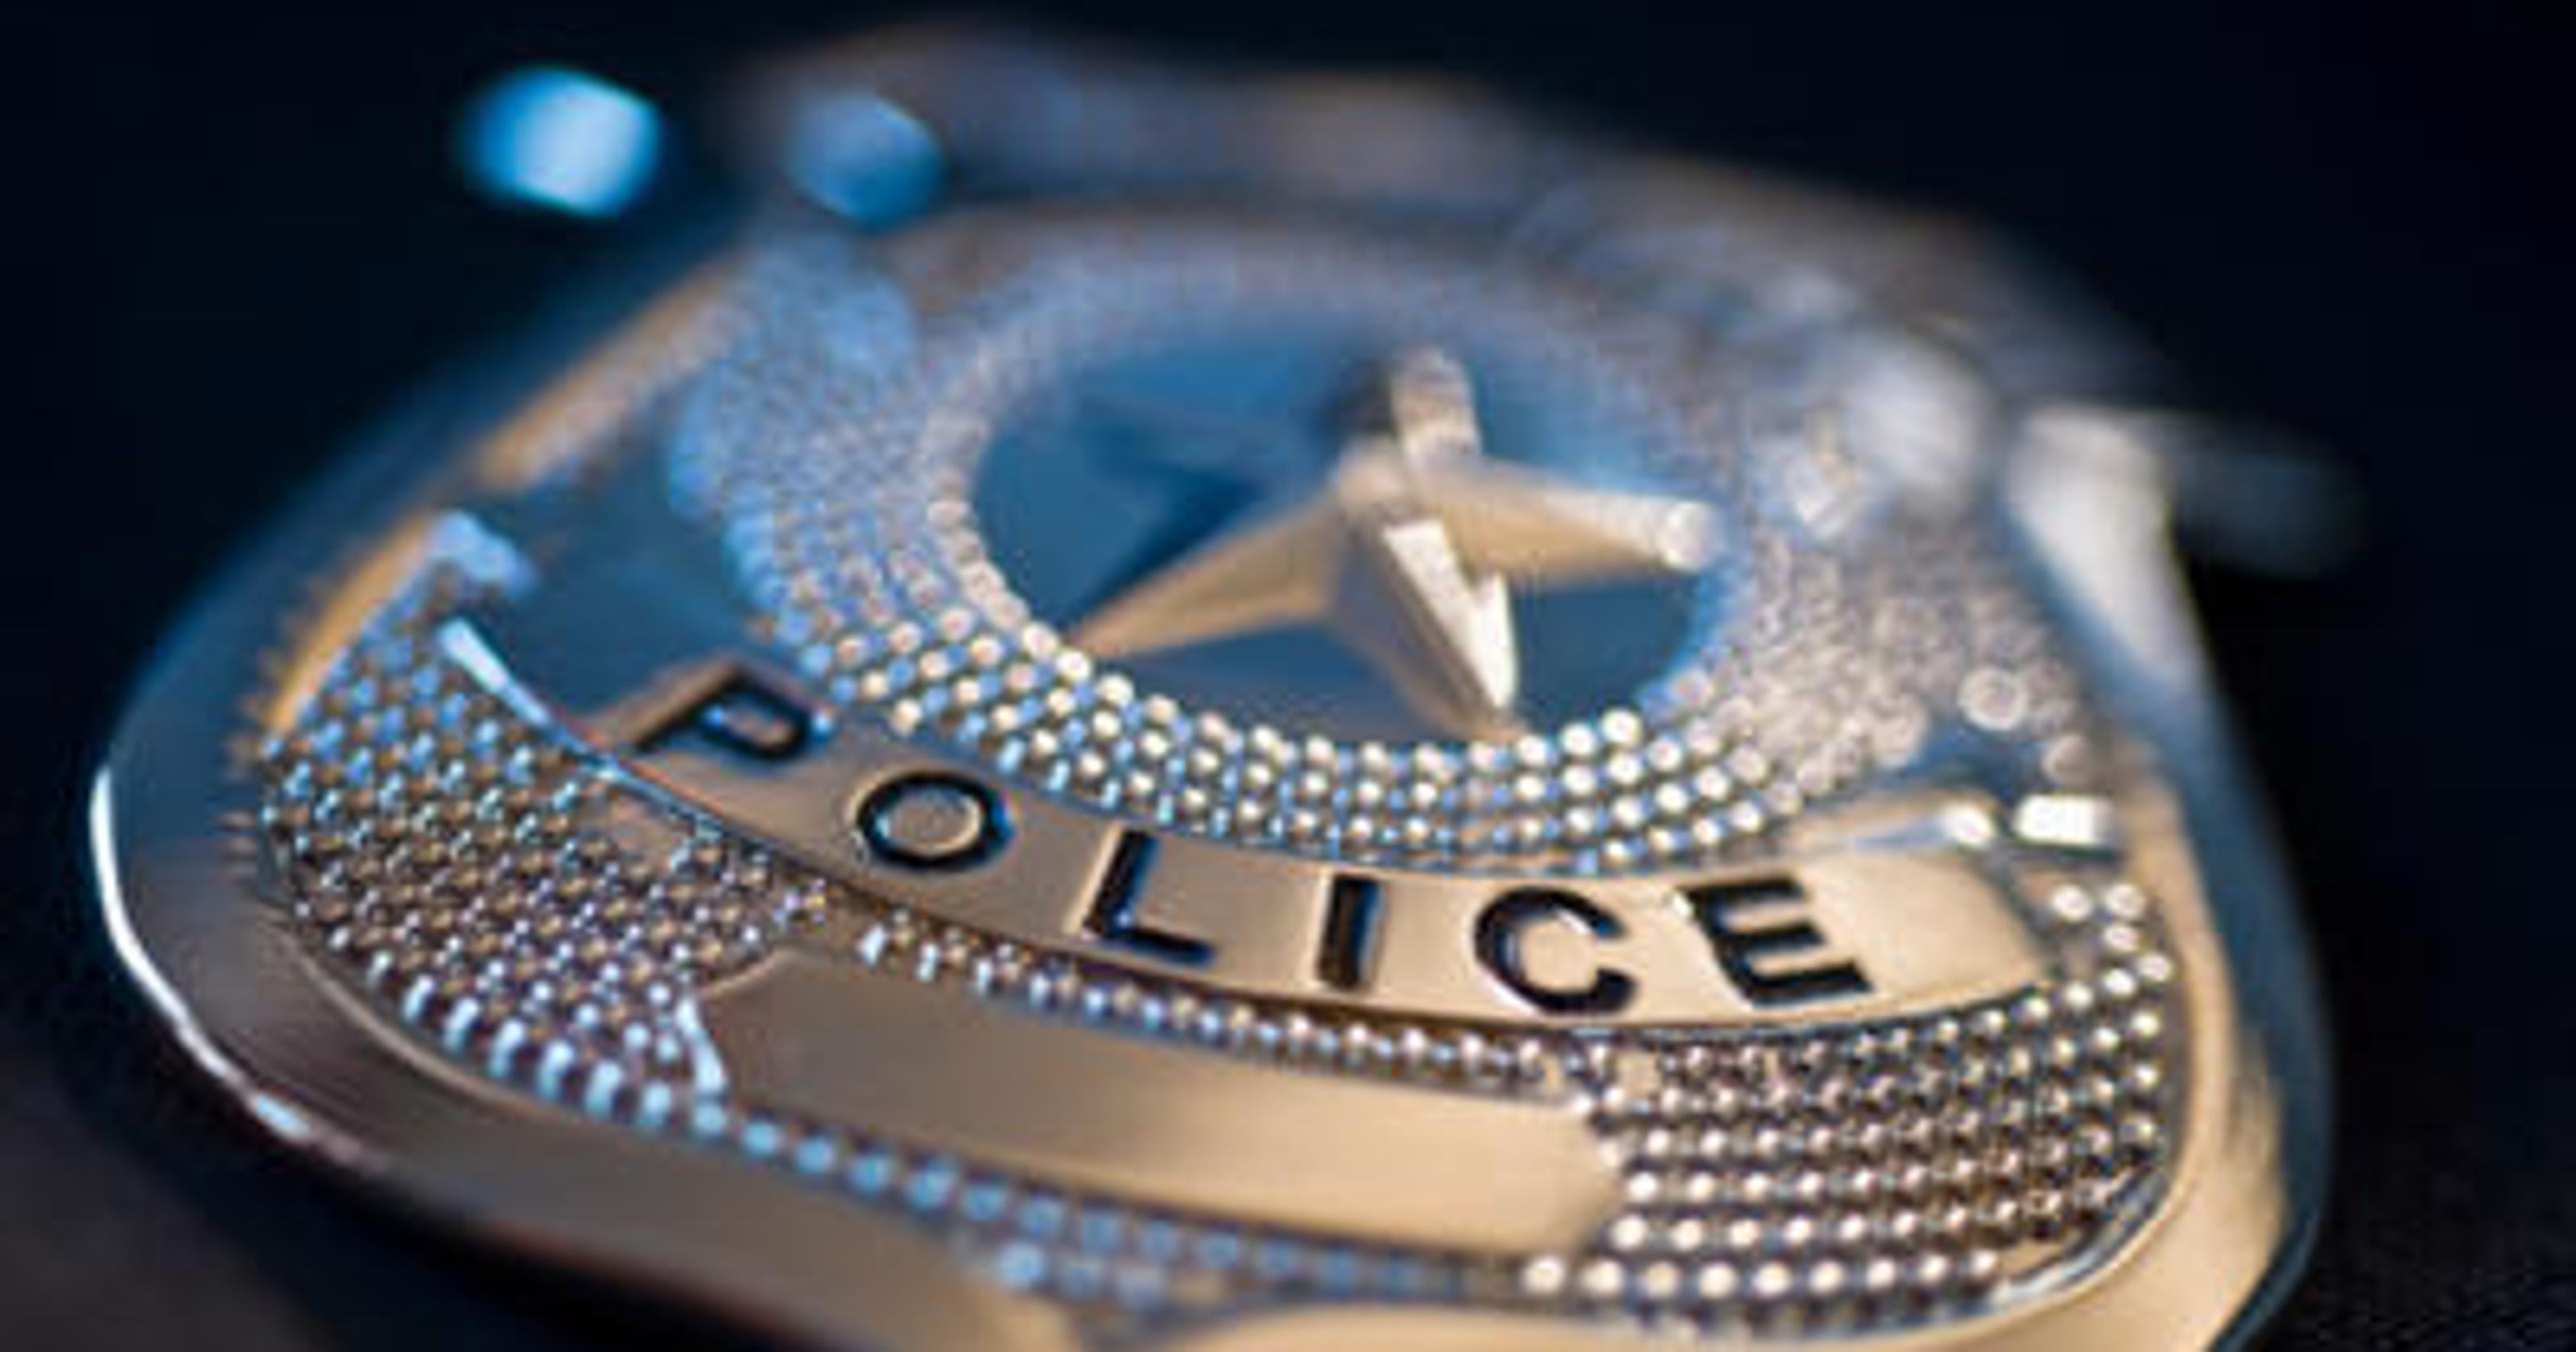 Nashville settles civil rights lawsuit against former cop